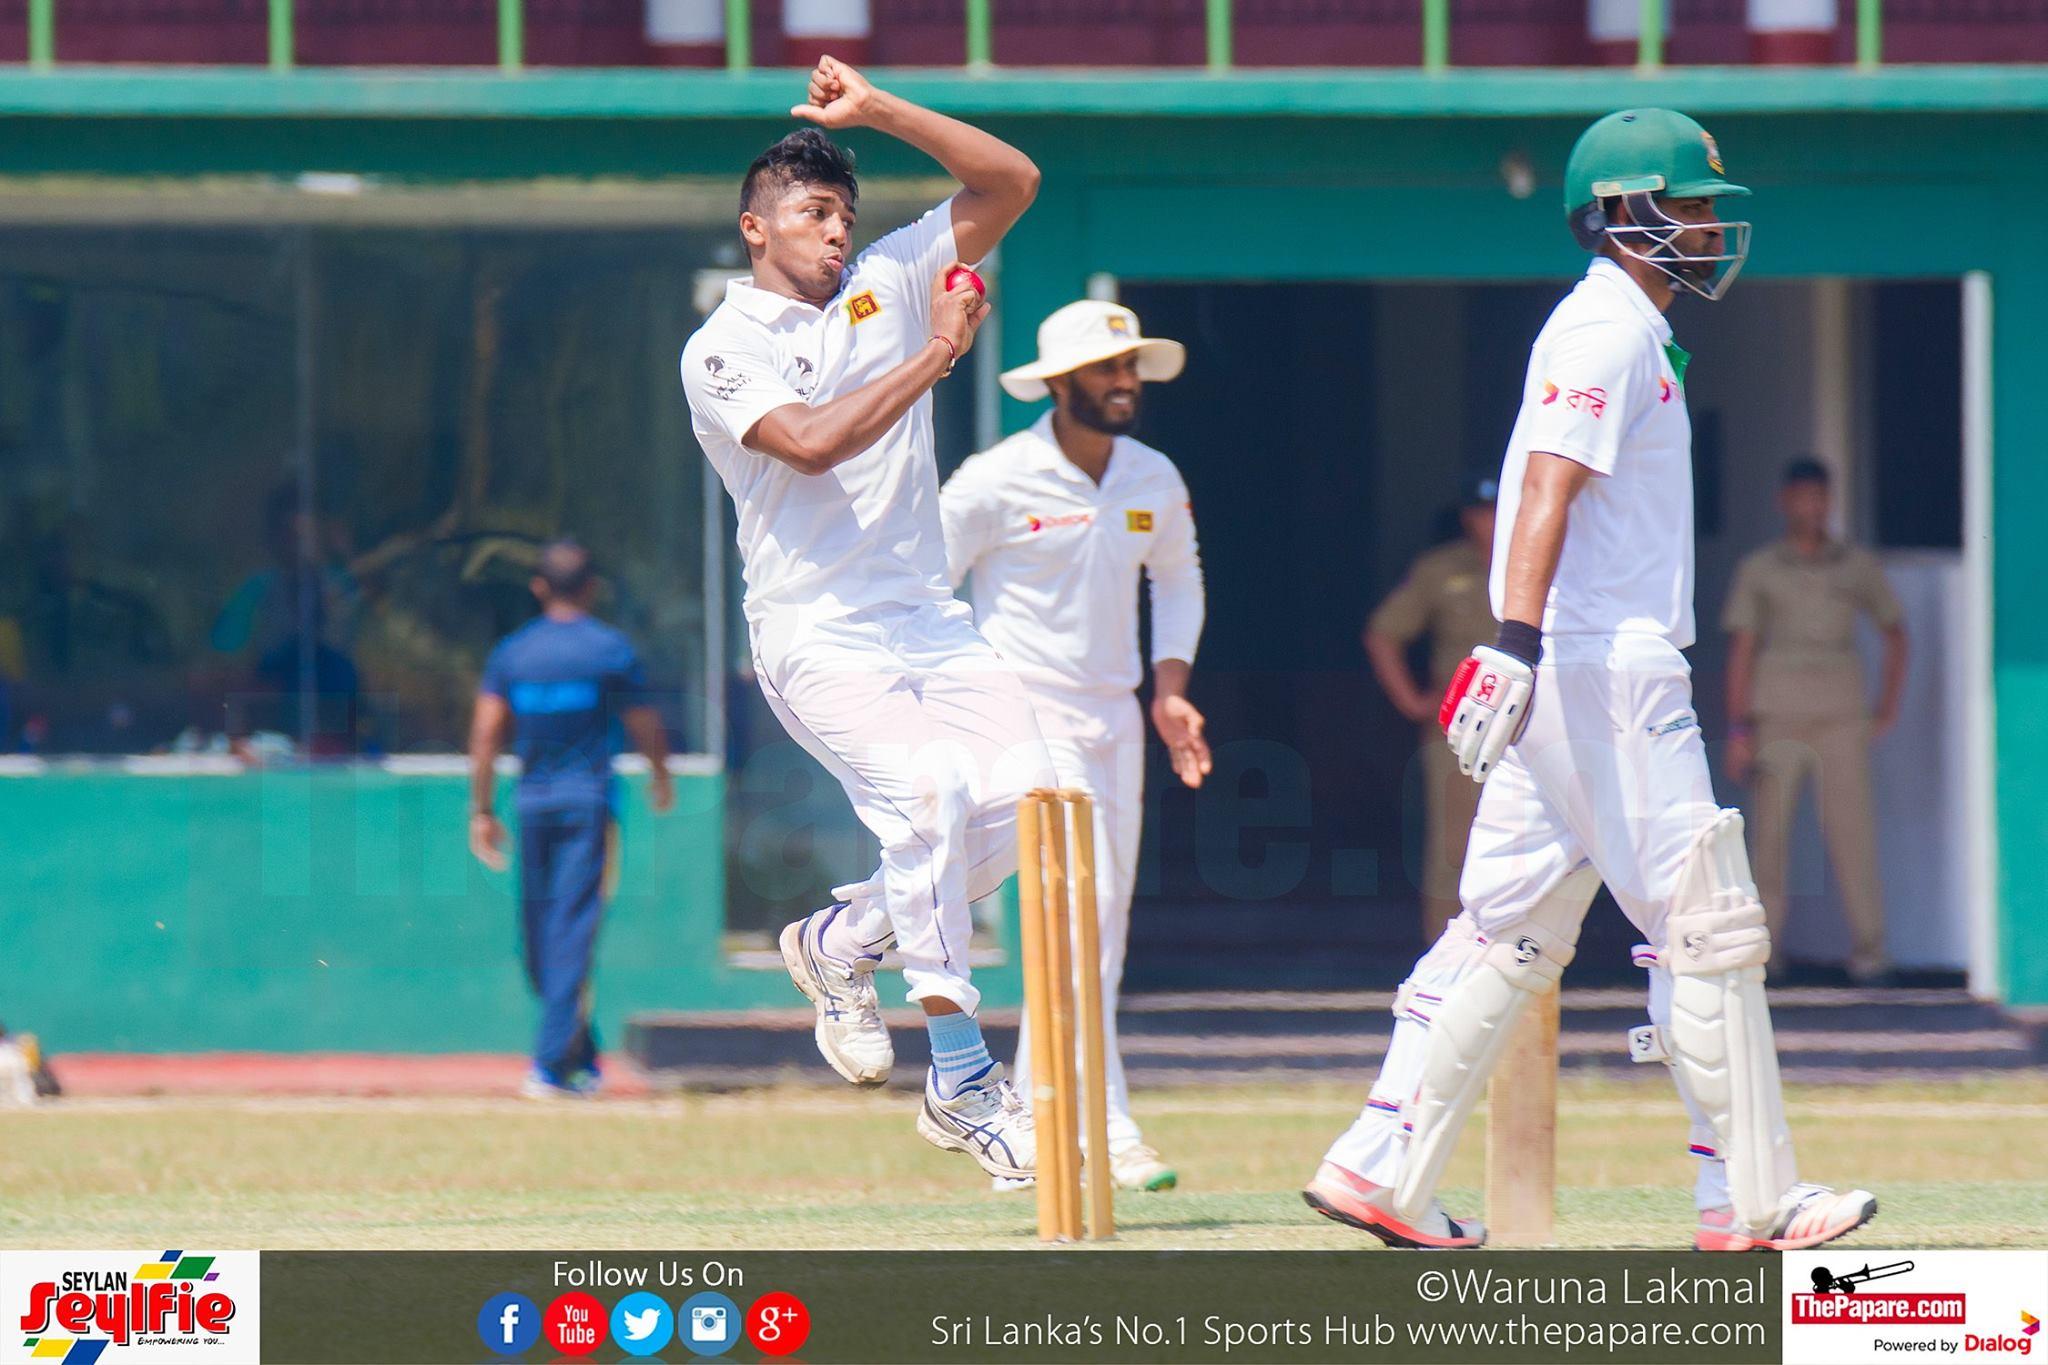 SL BP XI v Bangladesh - Day 1